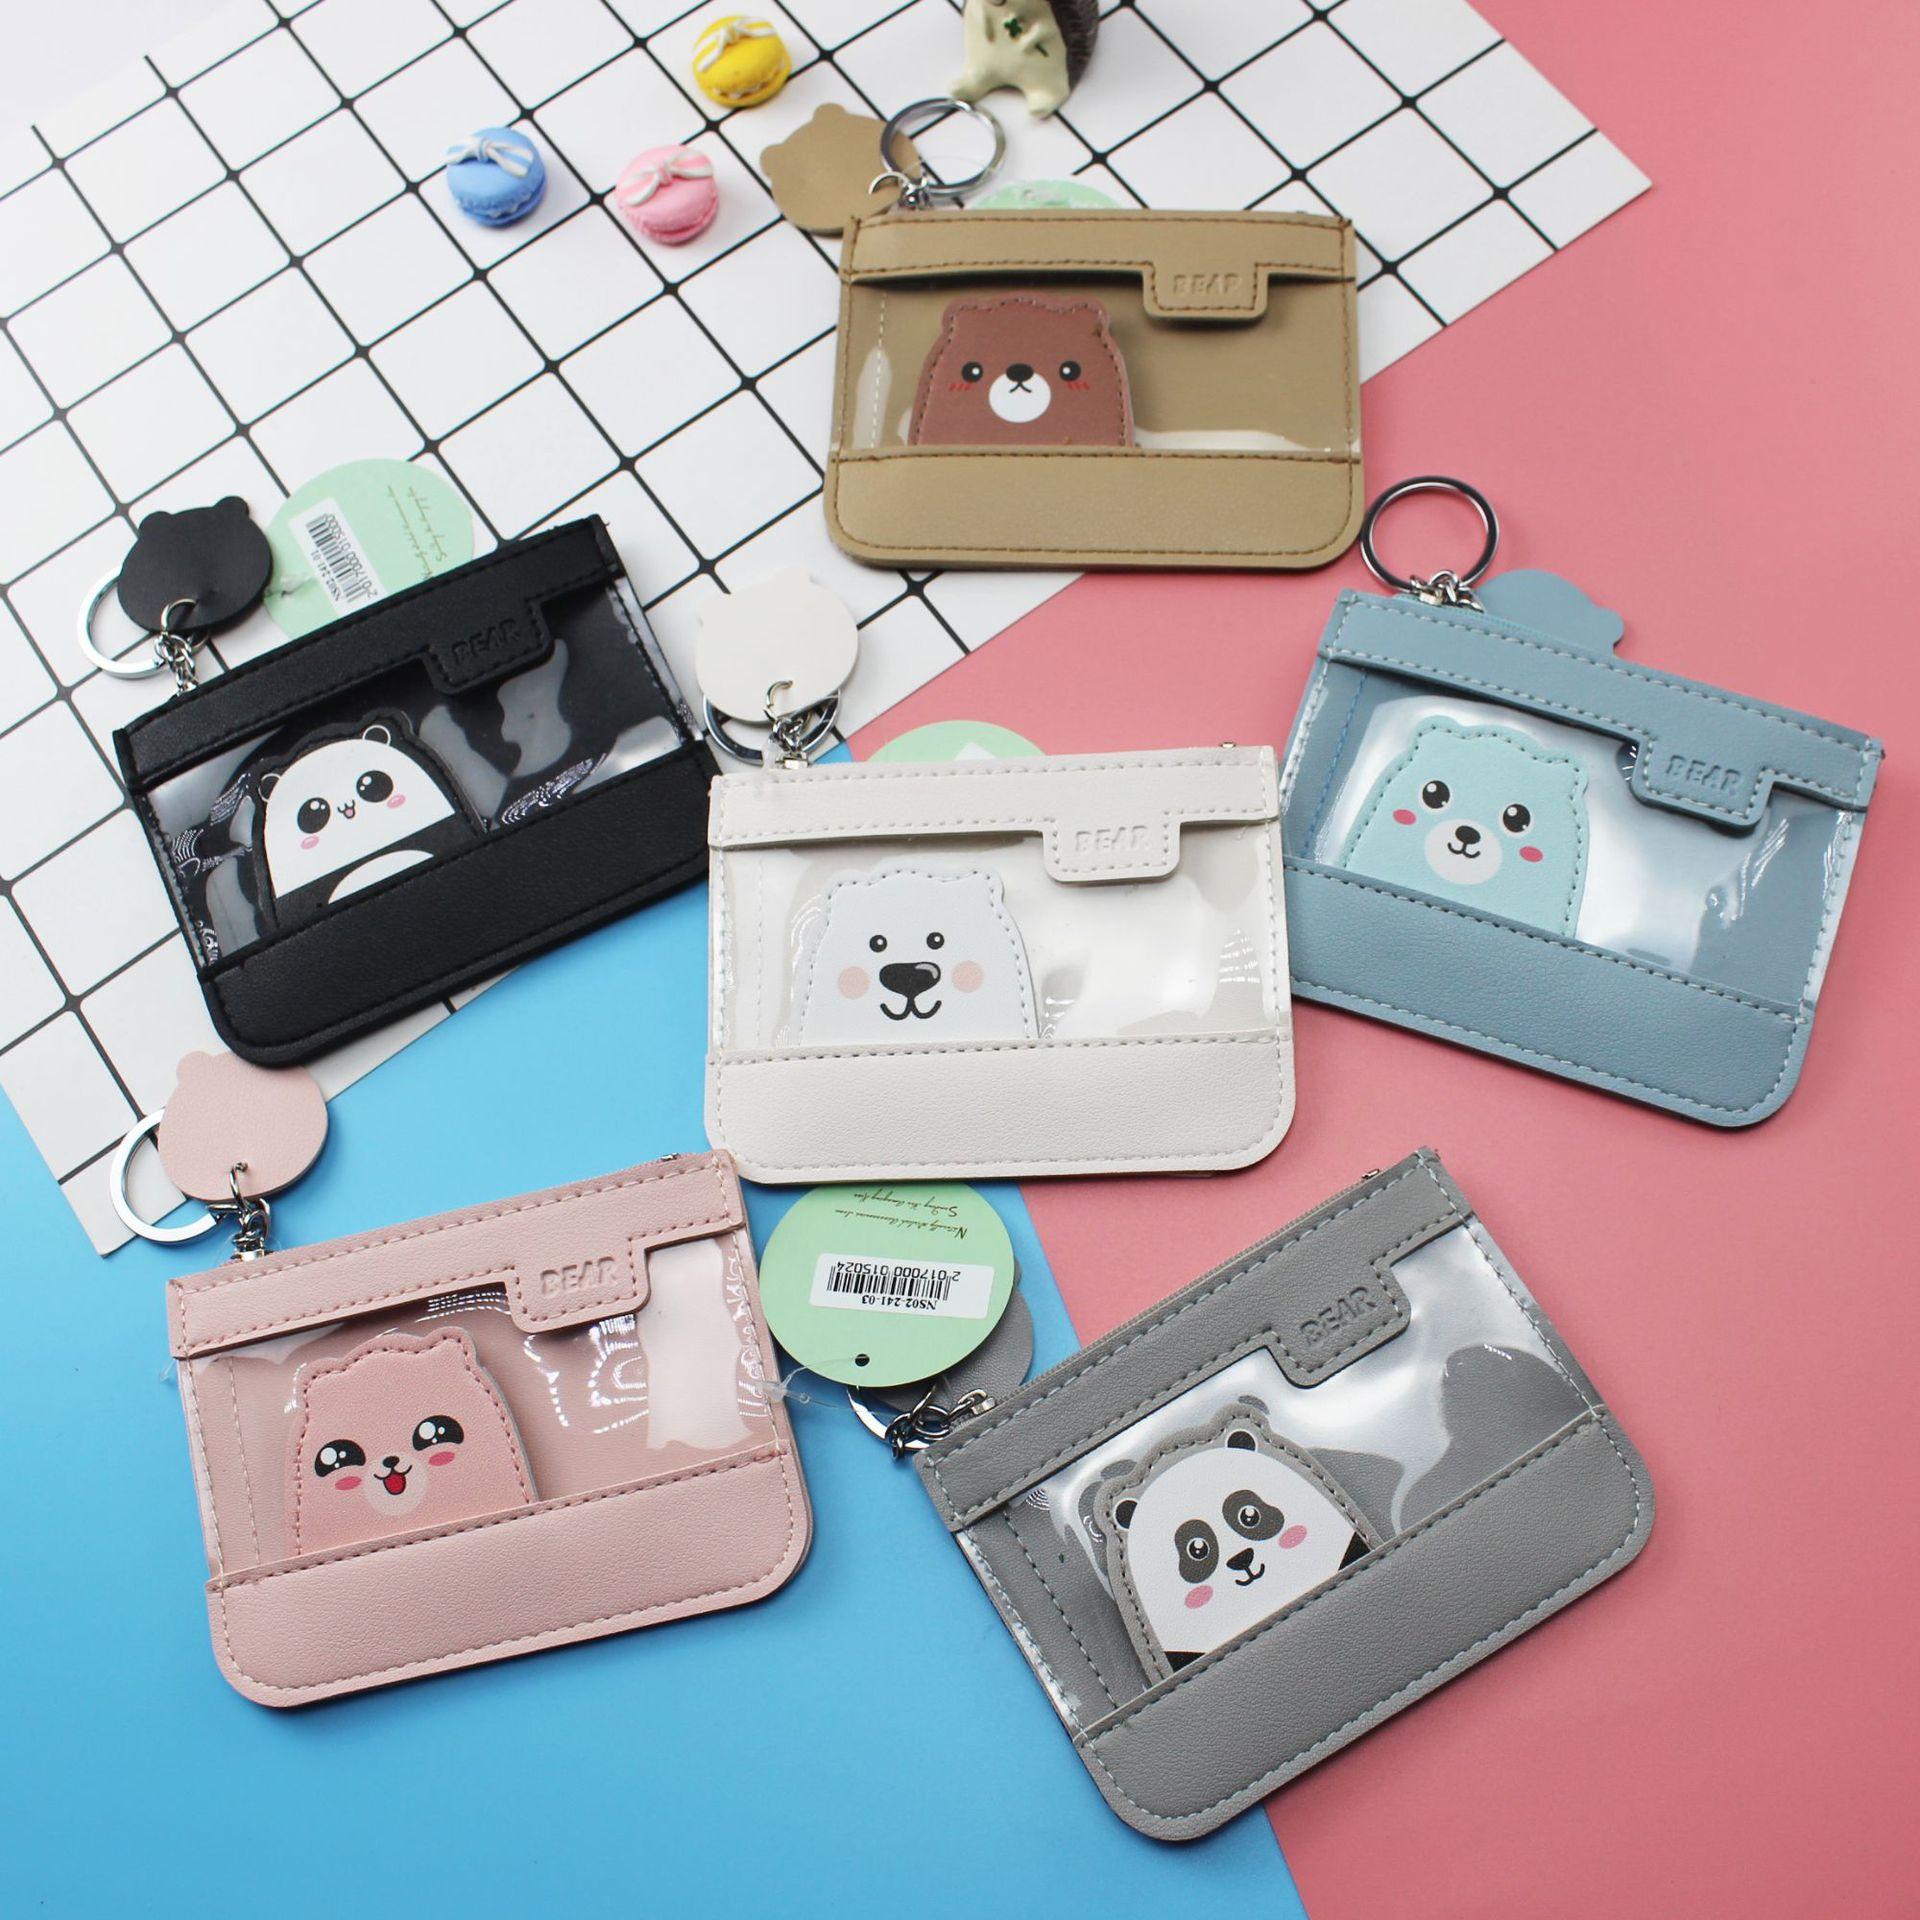 New Cartoon Bear Cat Coin Purse Splicing Gelatin Card Bag Coin Bag Student Creative Animal Storage Bag Dropshipping